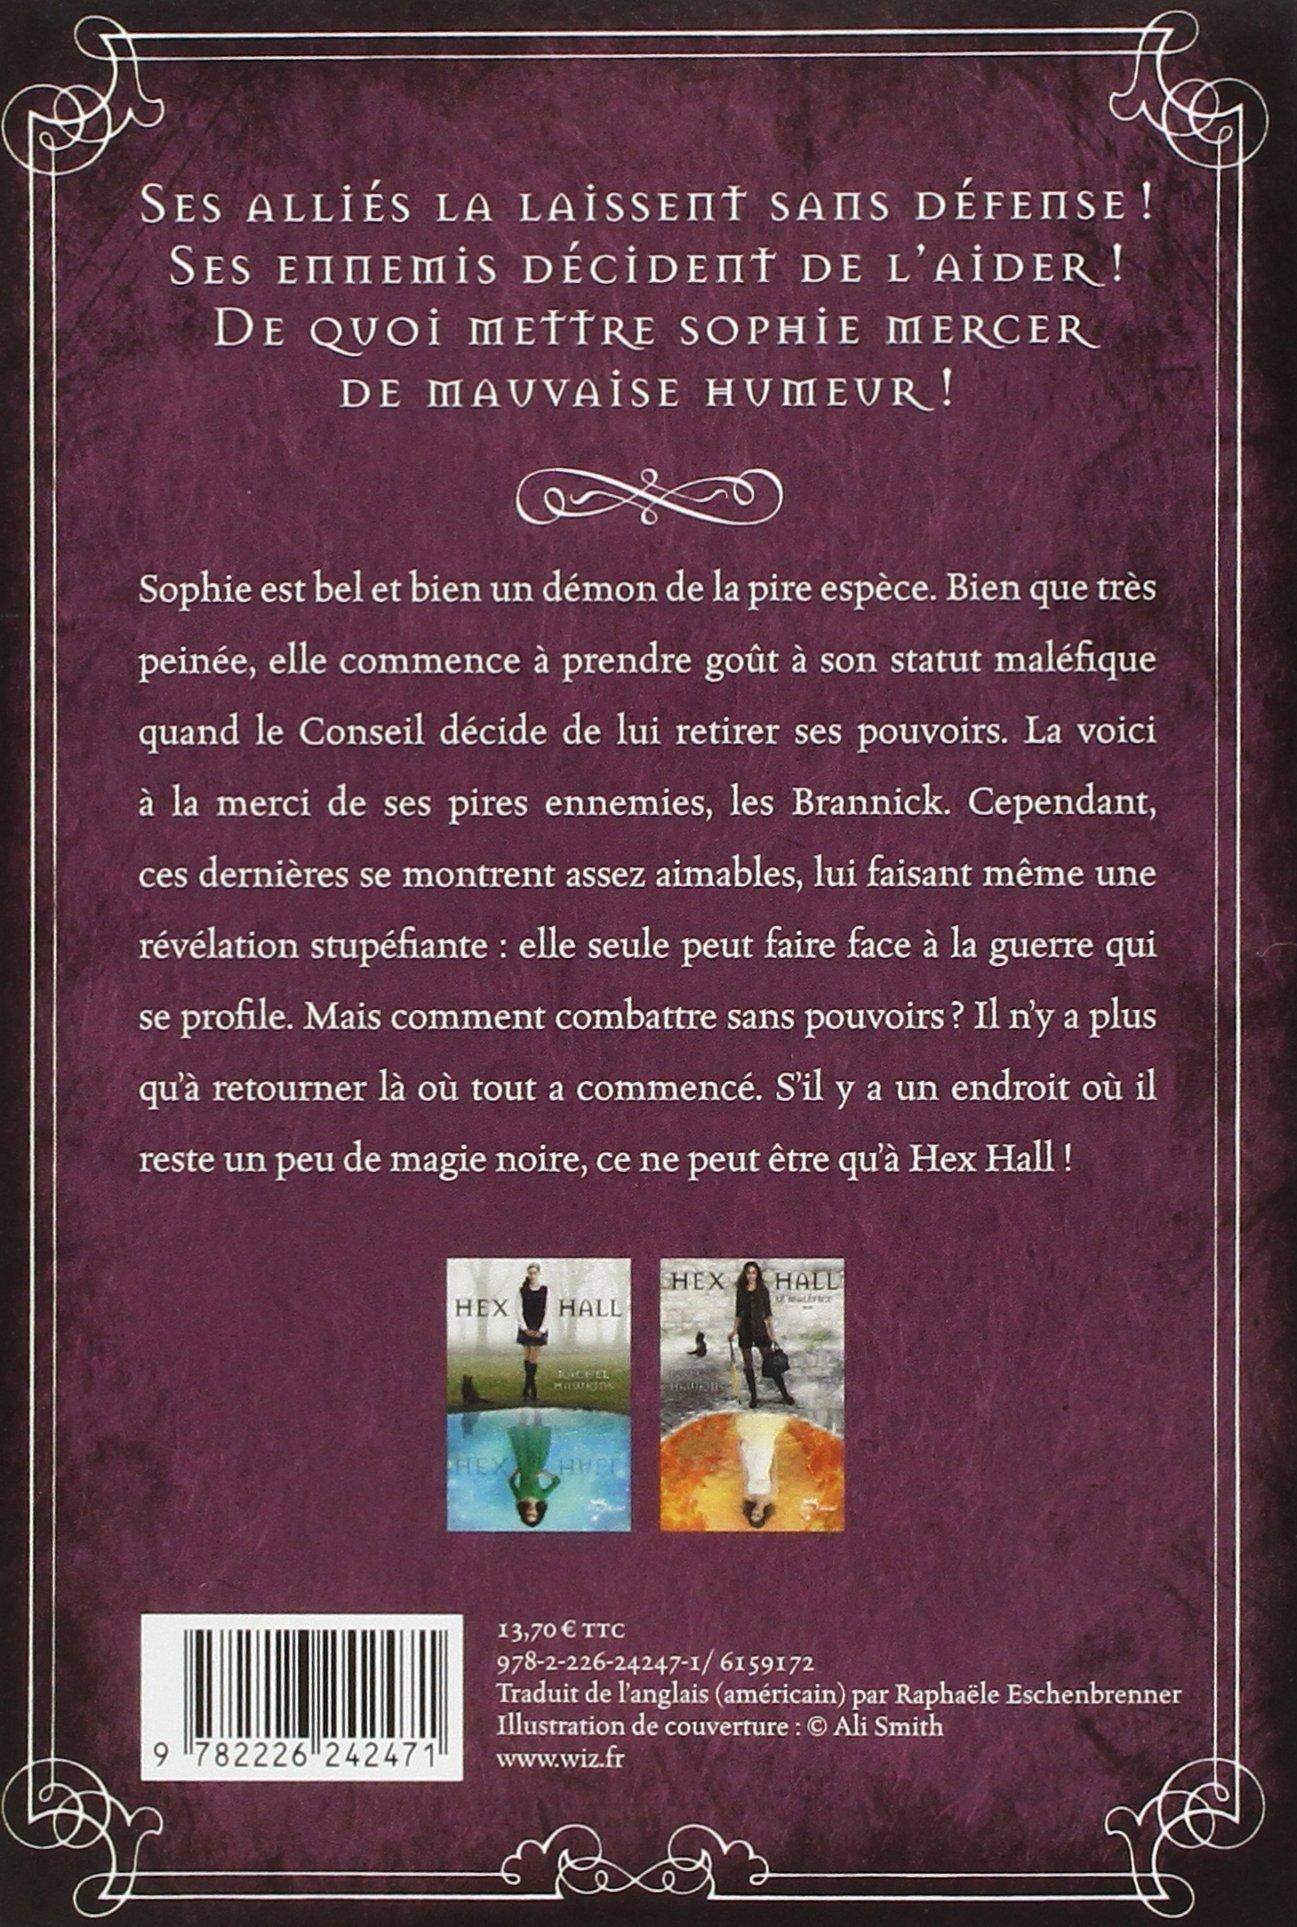 Amazon  Hex Hall, Tome 3 : Le Sacrifice  Rachel Hawkins, Rapha�le  Eschenbrenner  Livres